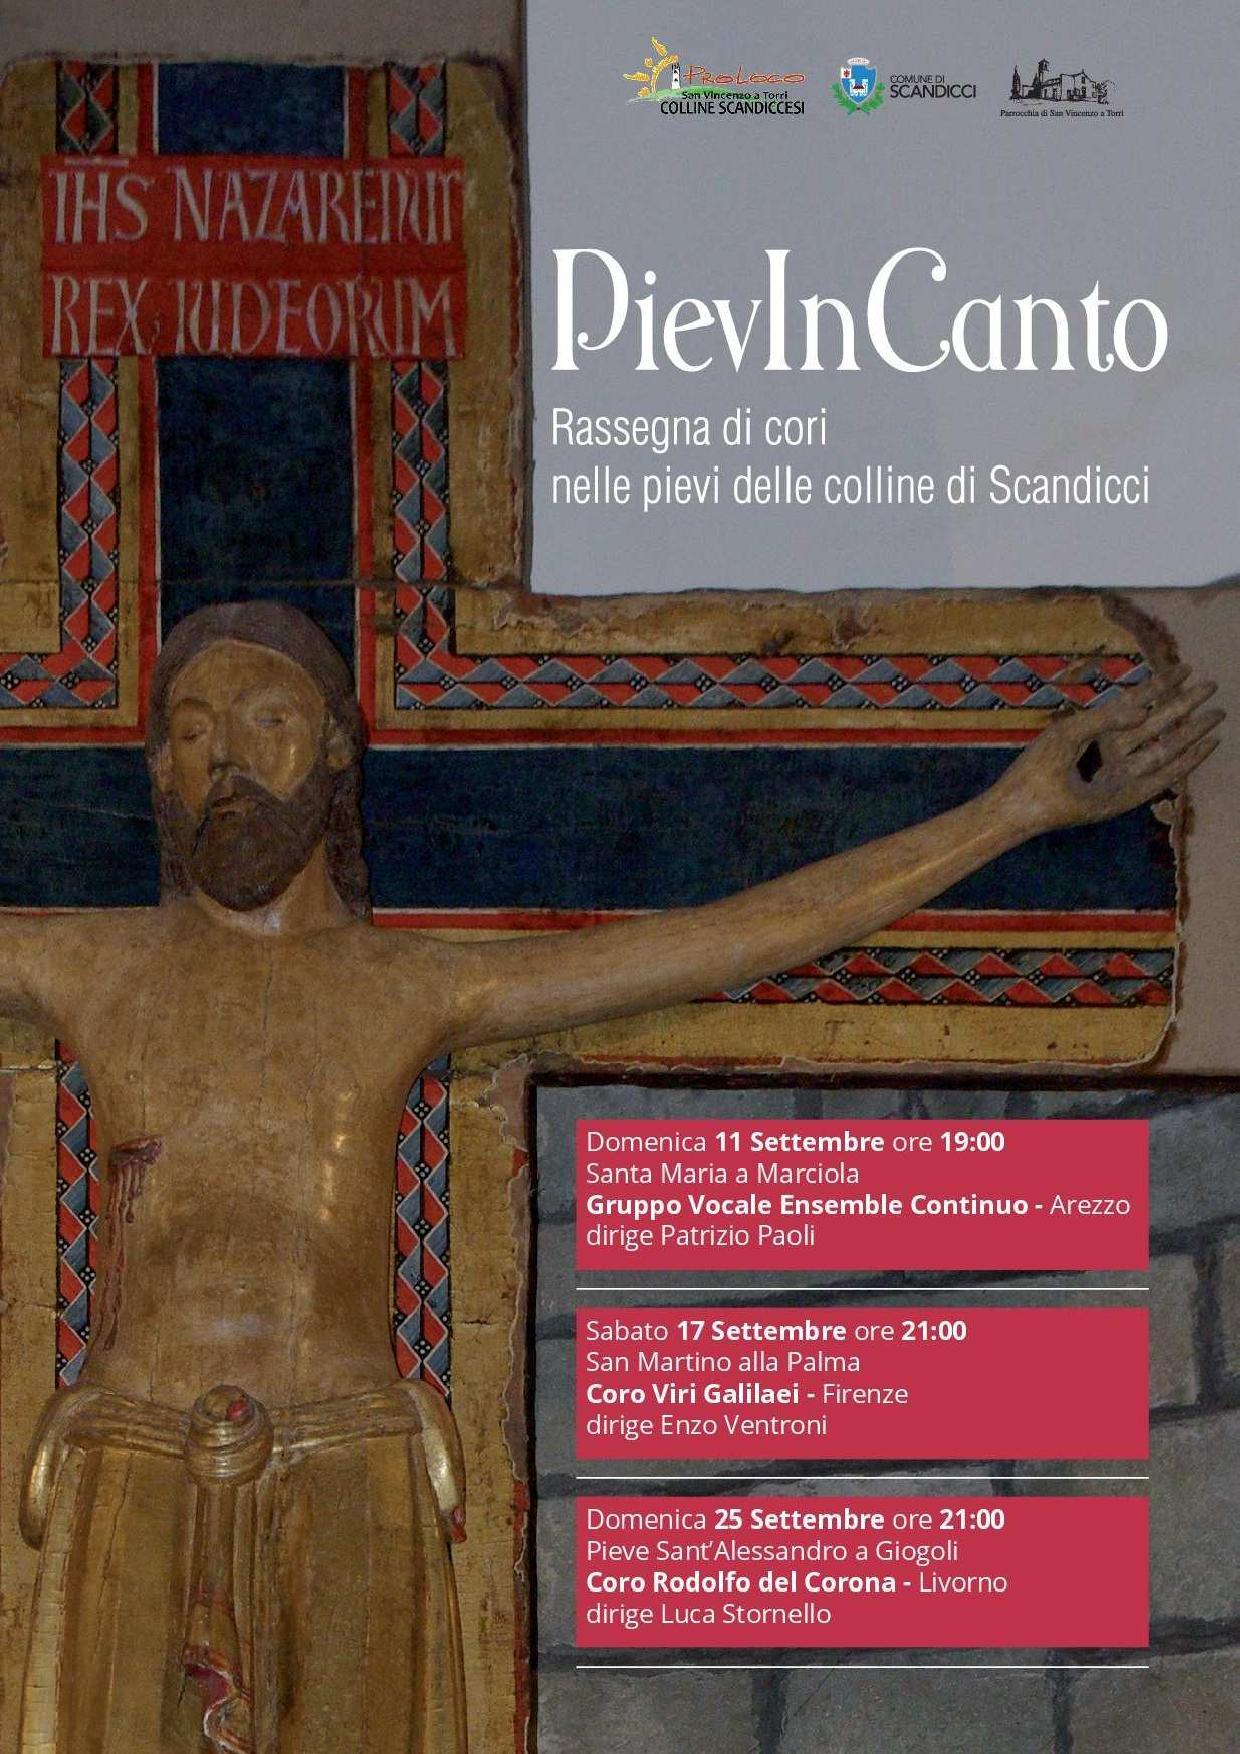 a4-leggera-pievincanto-2016-page-001-jpg